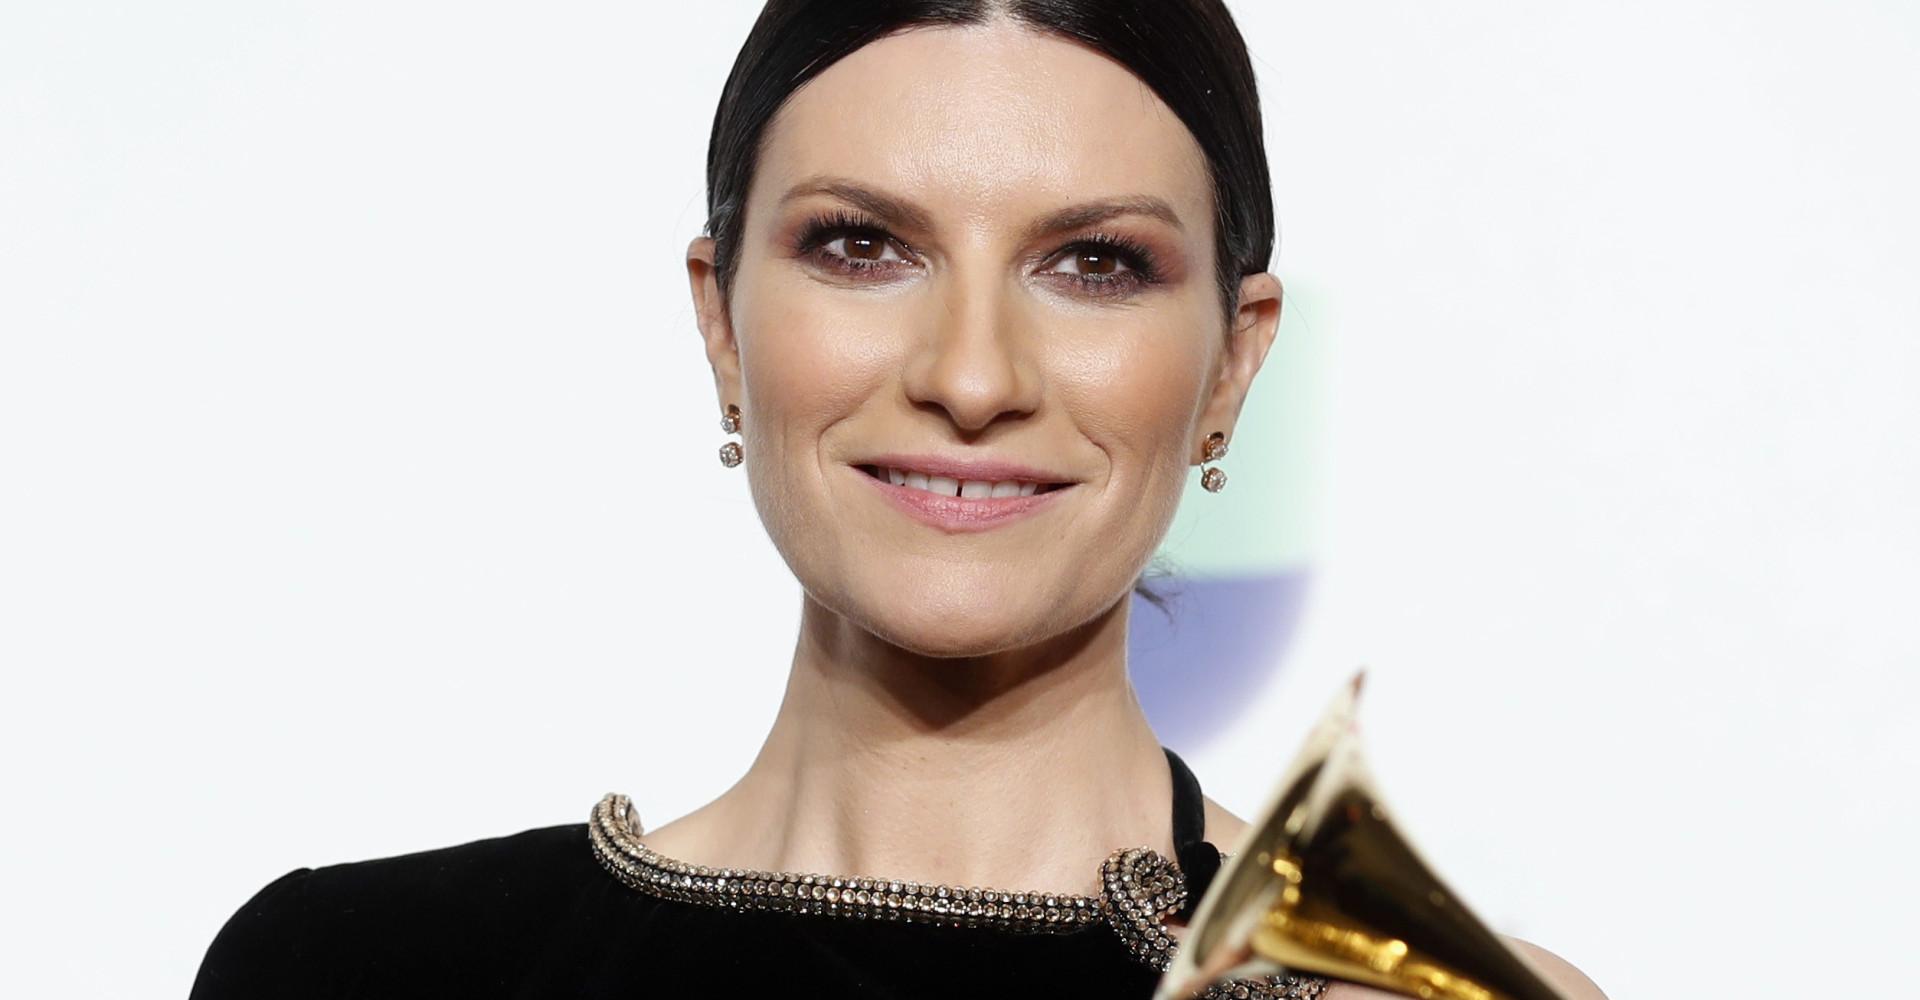 Laura Pausini: com'è arrivata a conquistare l'America Latina?